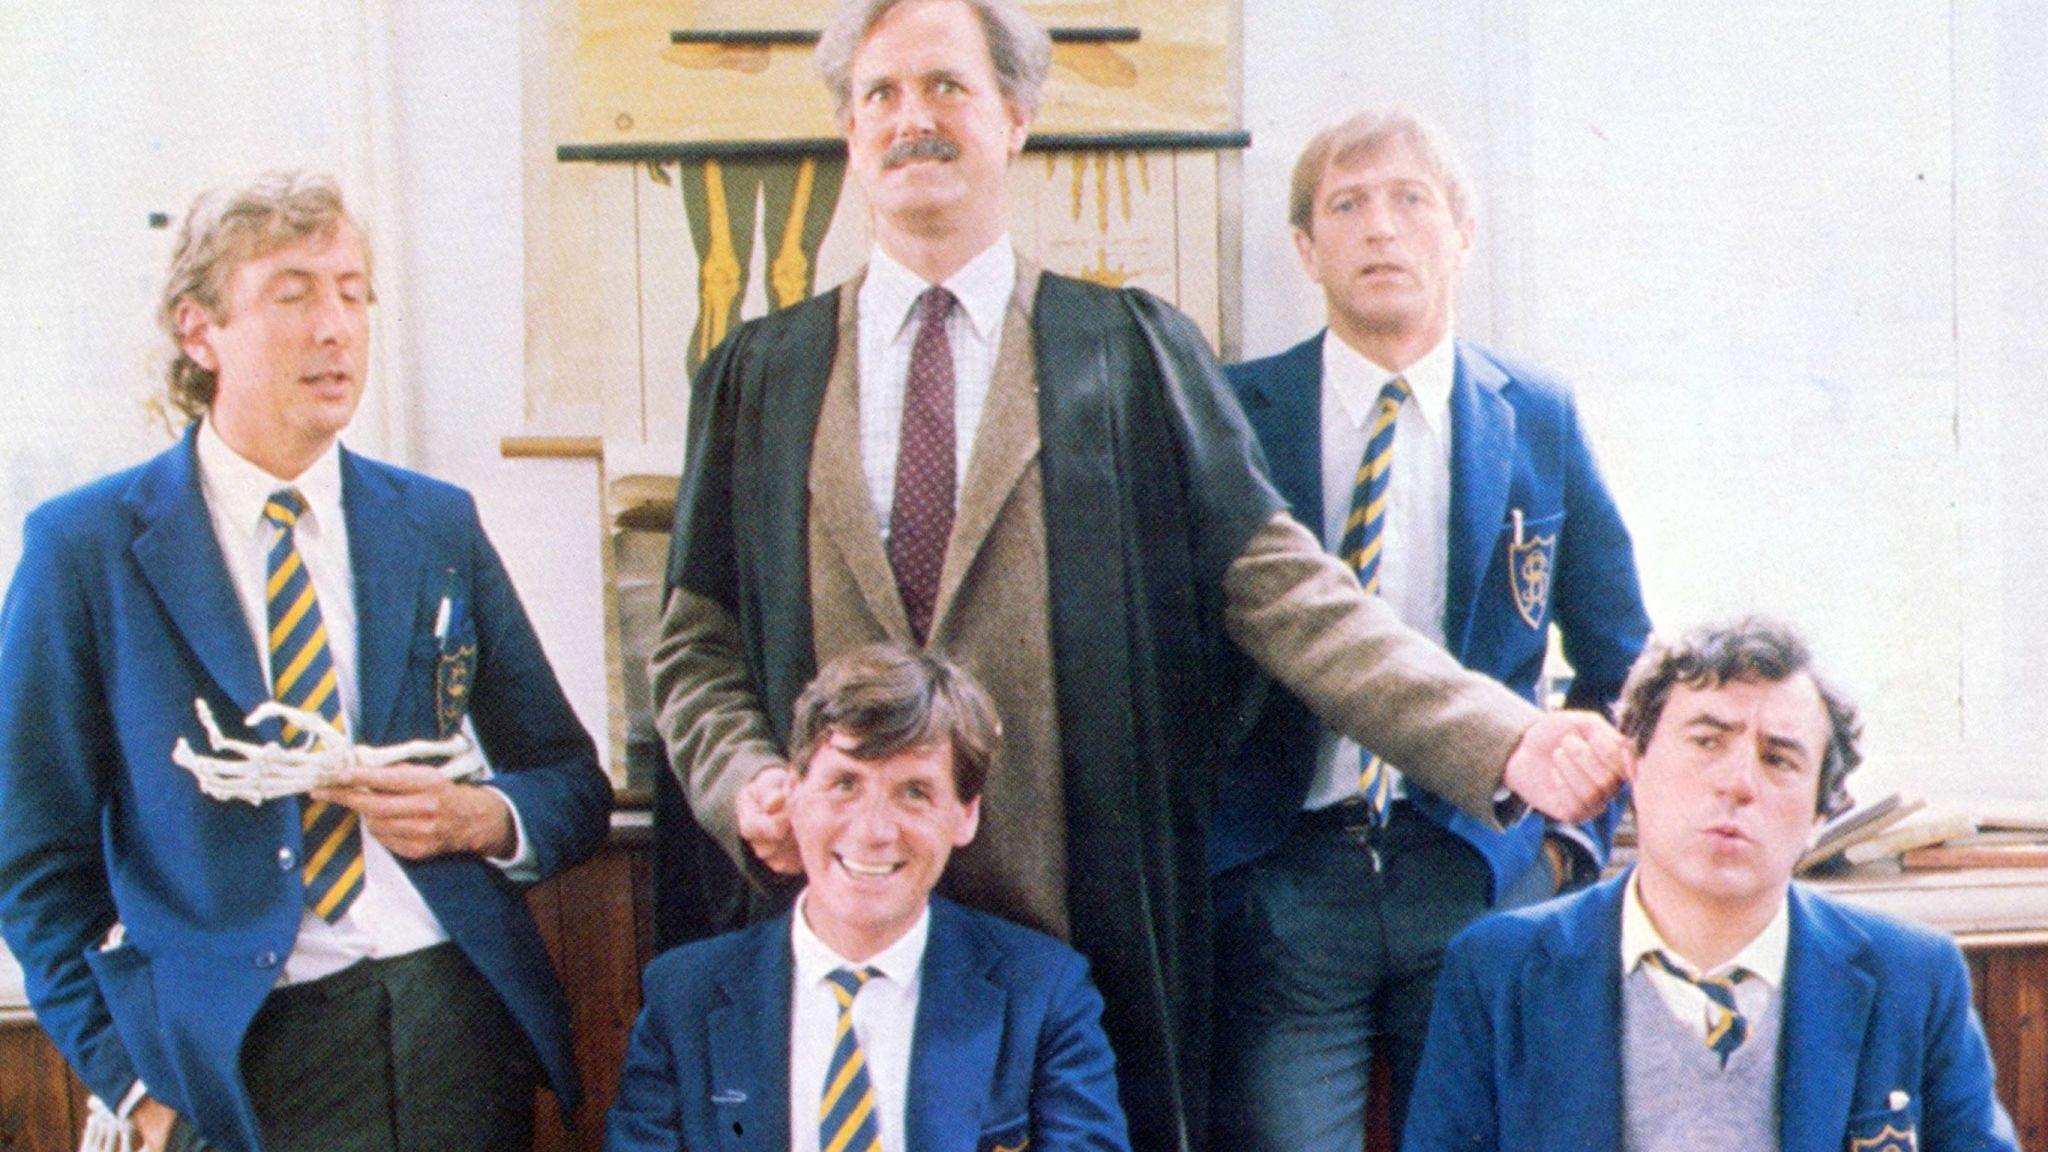 Monty Python's The Meaning Of Life, Eric Idle, Michael Palin, John Cleese, Graham Chapman, Terry Jones, 1983